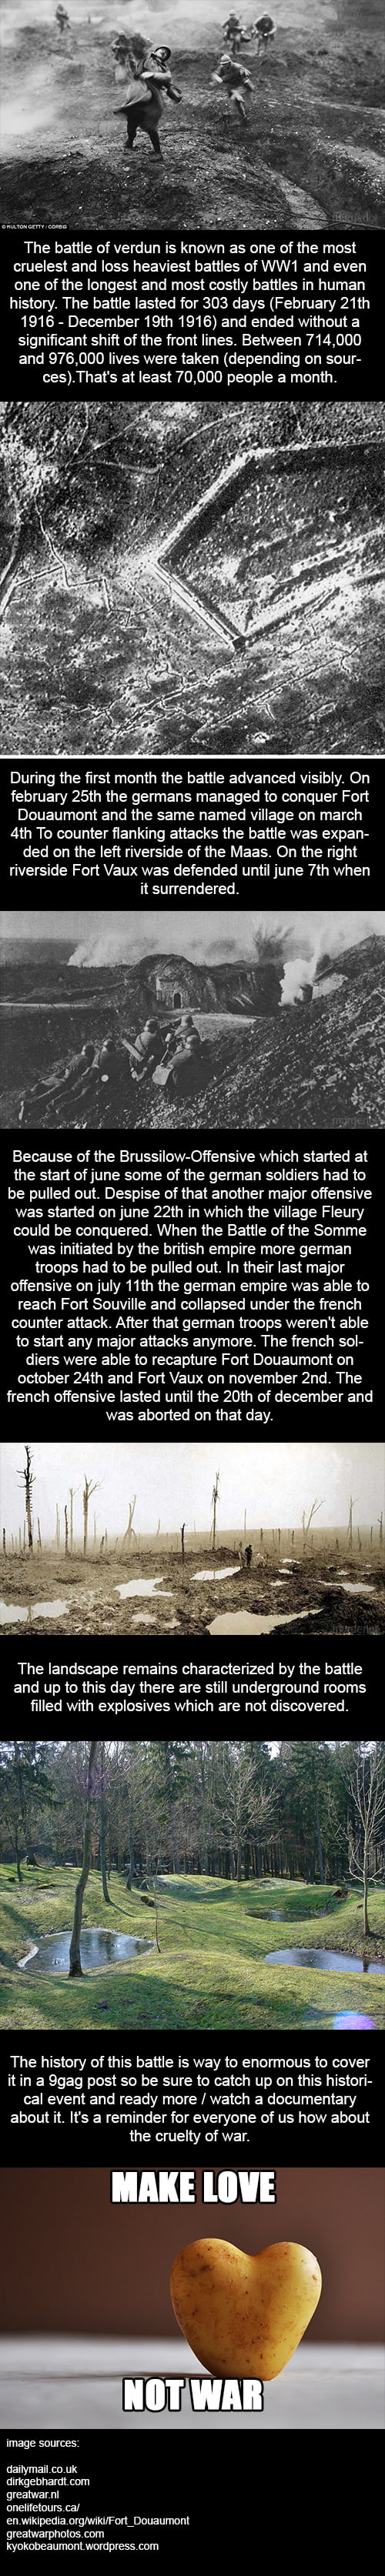 The Battle of Verdun (1916) - a short summary of history